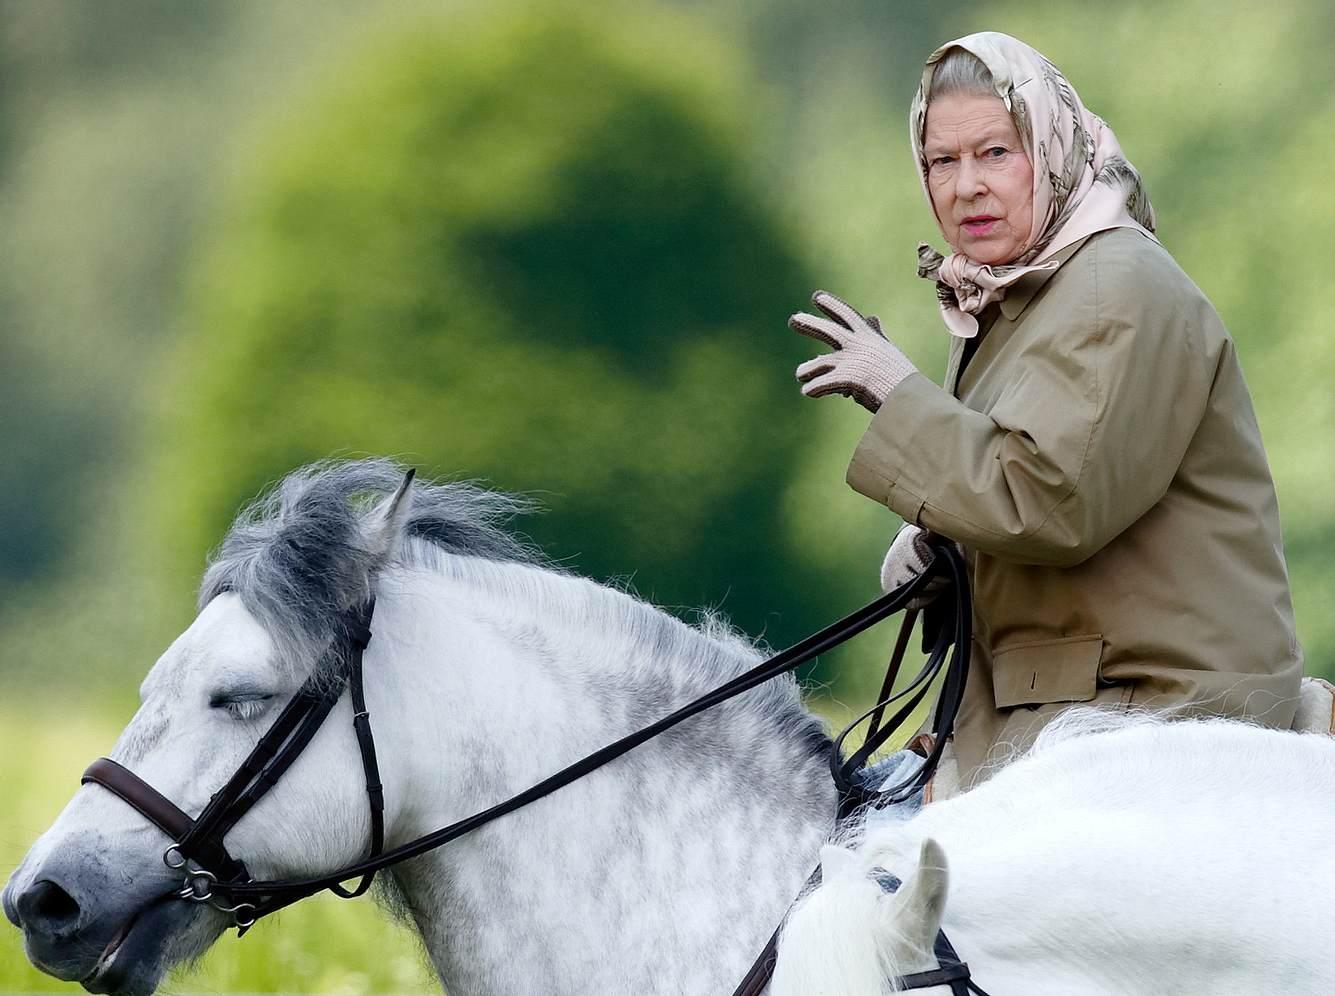 Königin Elizabeth II. hoch zu Ross am 2. Juni 2006